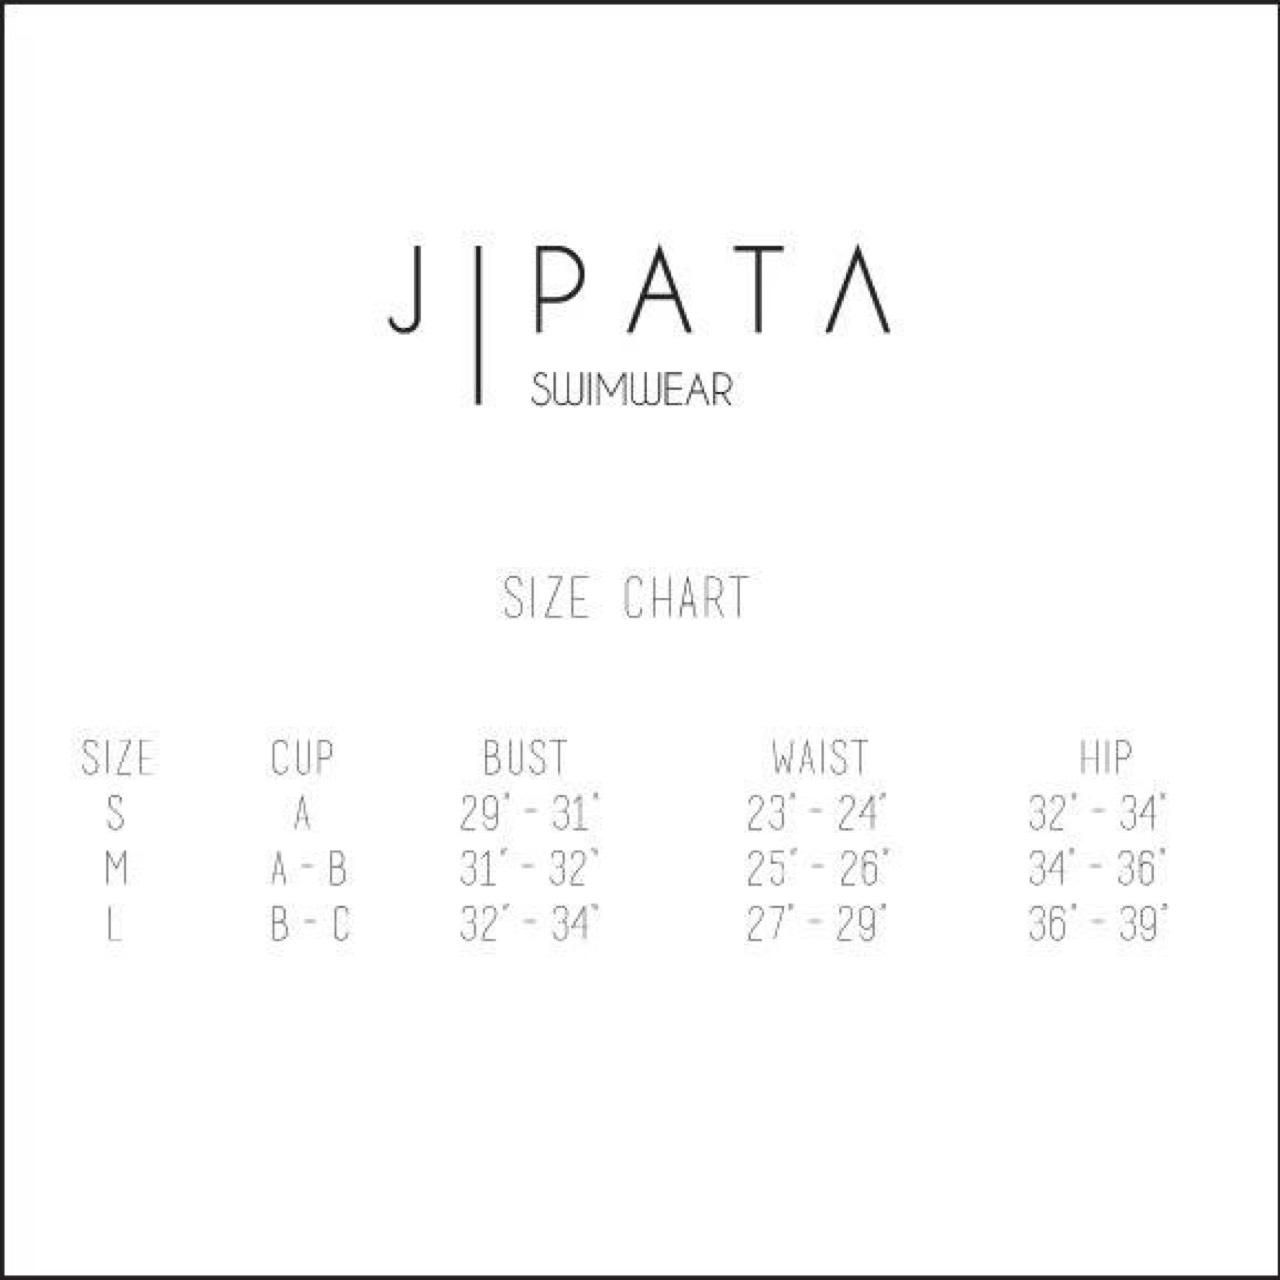 jipata,jipataswimwear,alex,swimsuit,swimwear,beachwear,hipster,minimal,minimalism,ชุดว่ายน้ำ,ฮิปสเตอร์